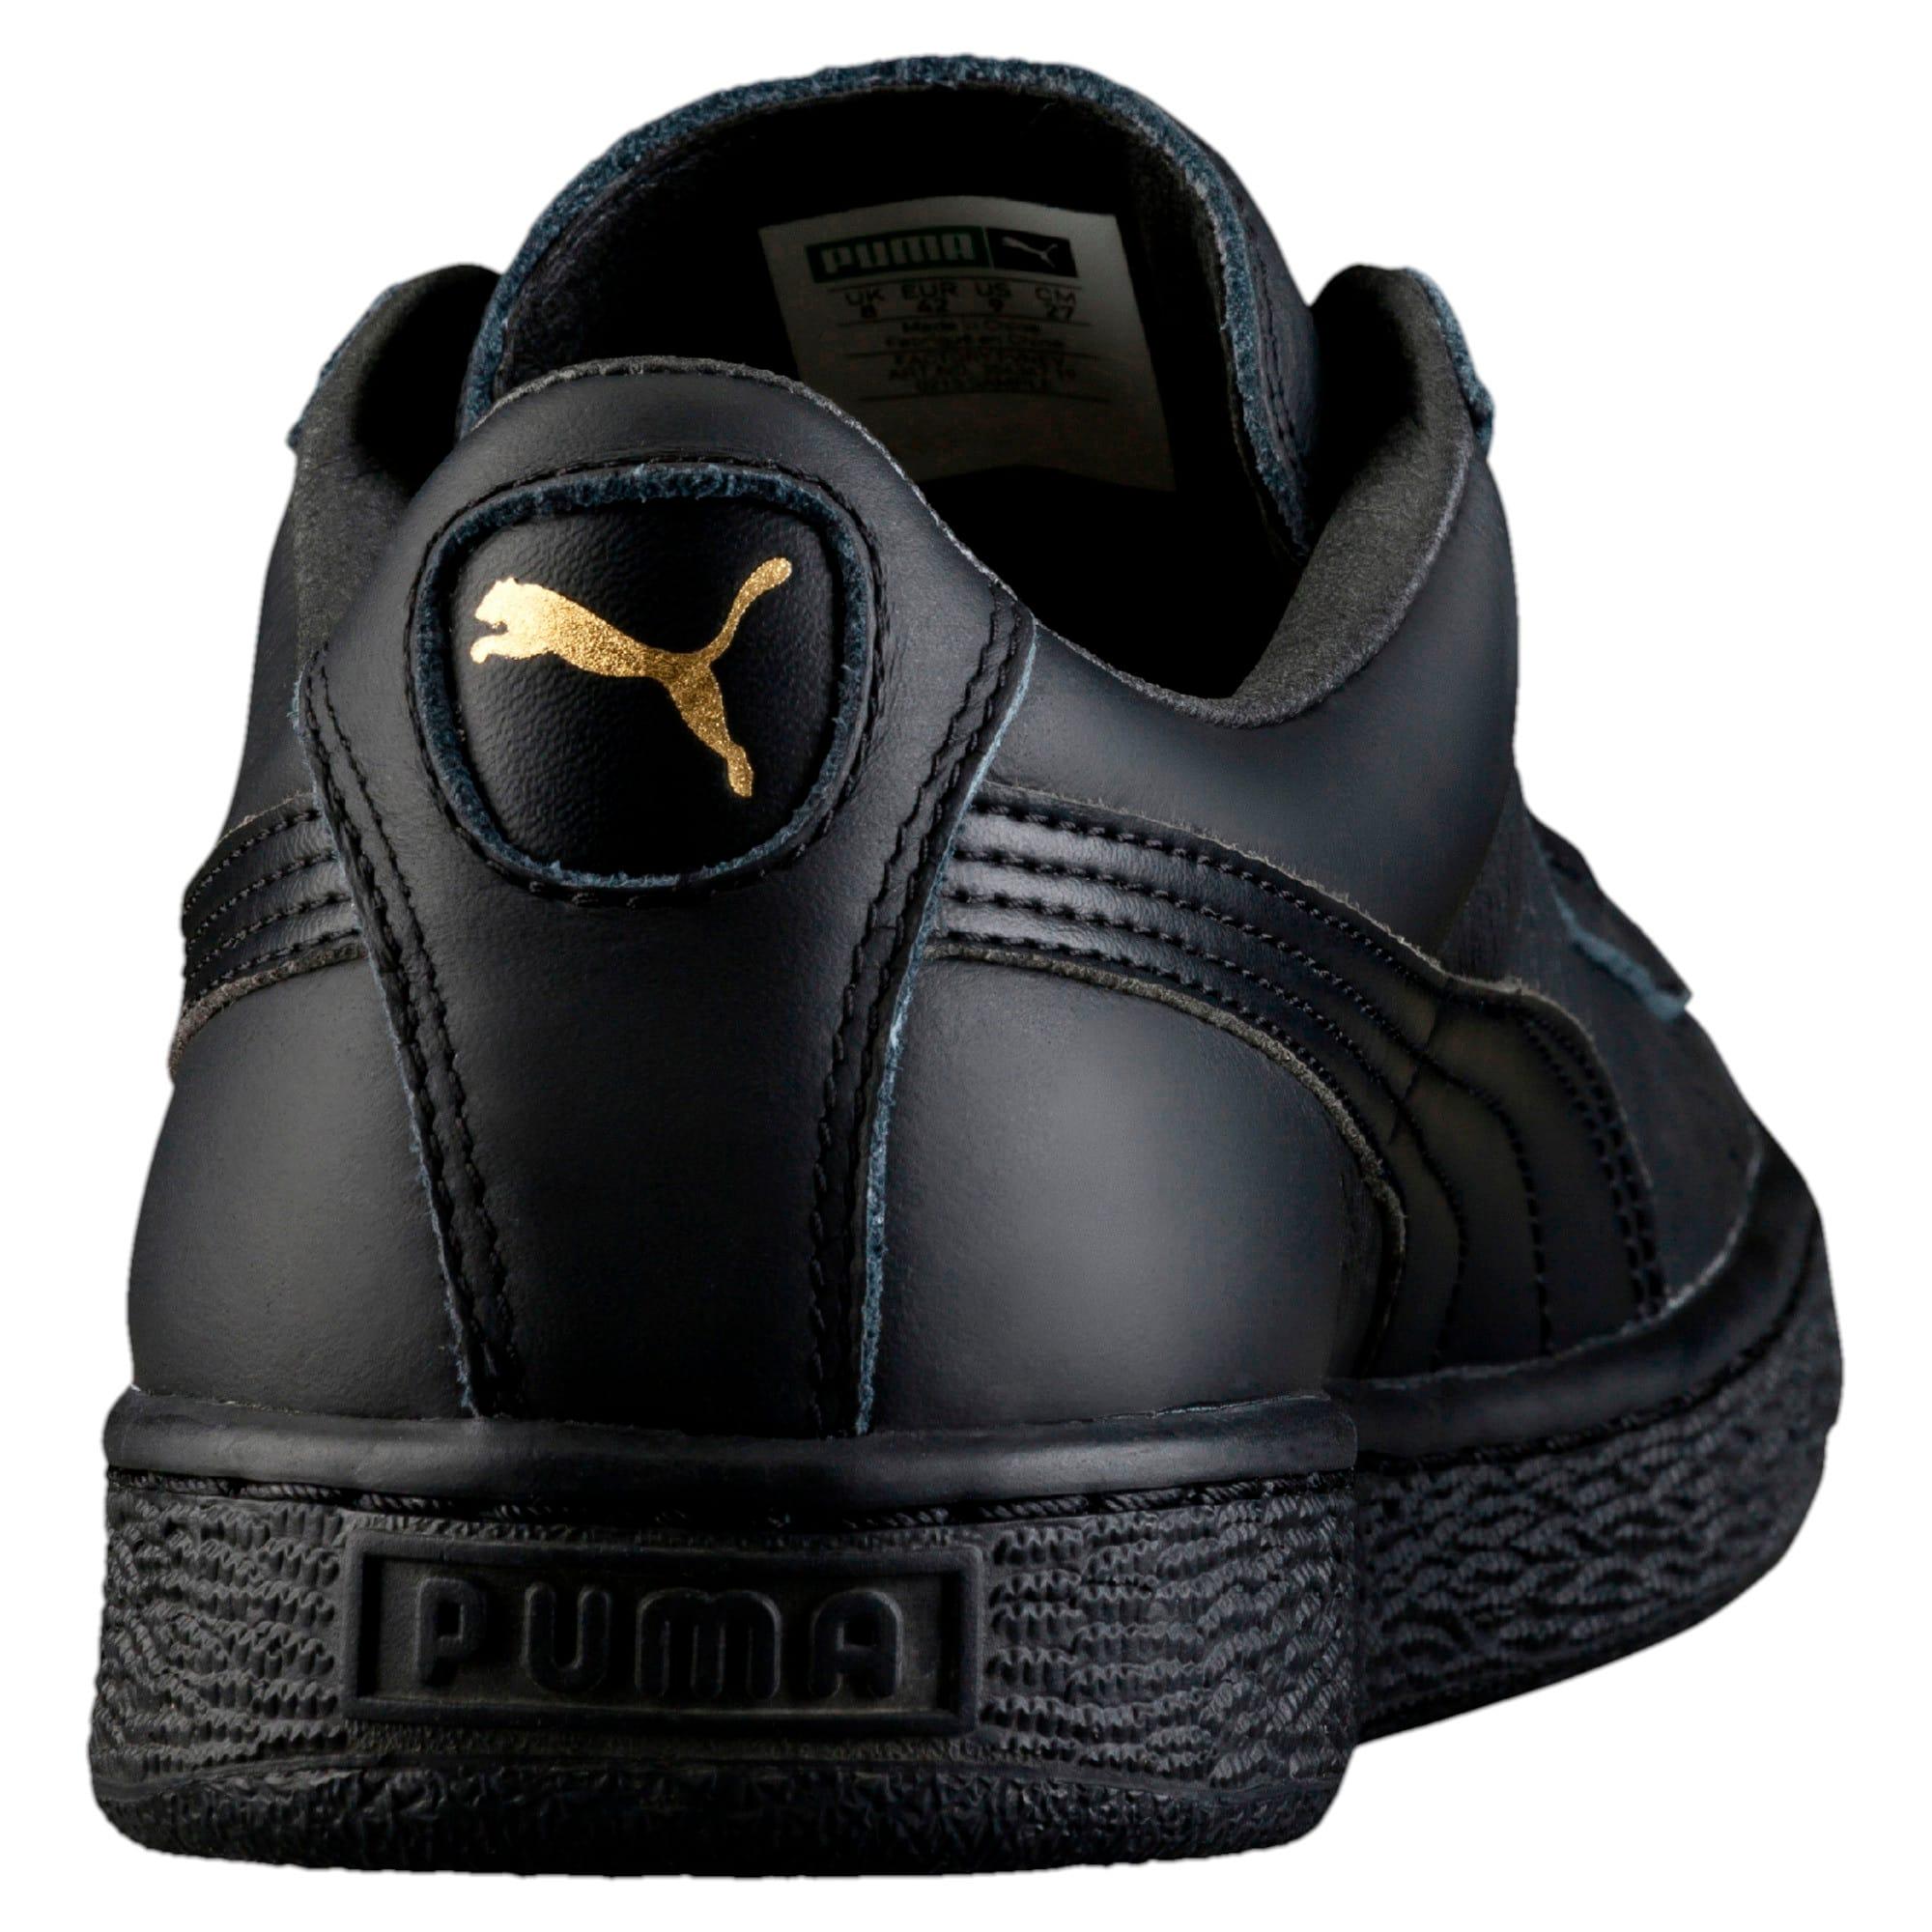 Thumbnail 3 of Basket Classic LFS Men's Shoes, black-team gold, medium-IND